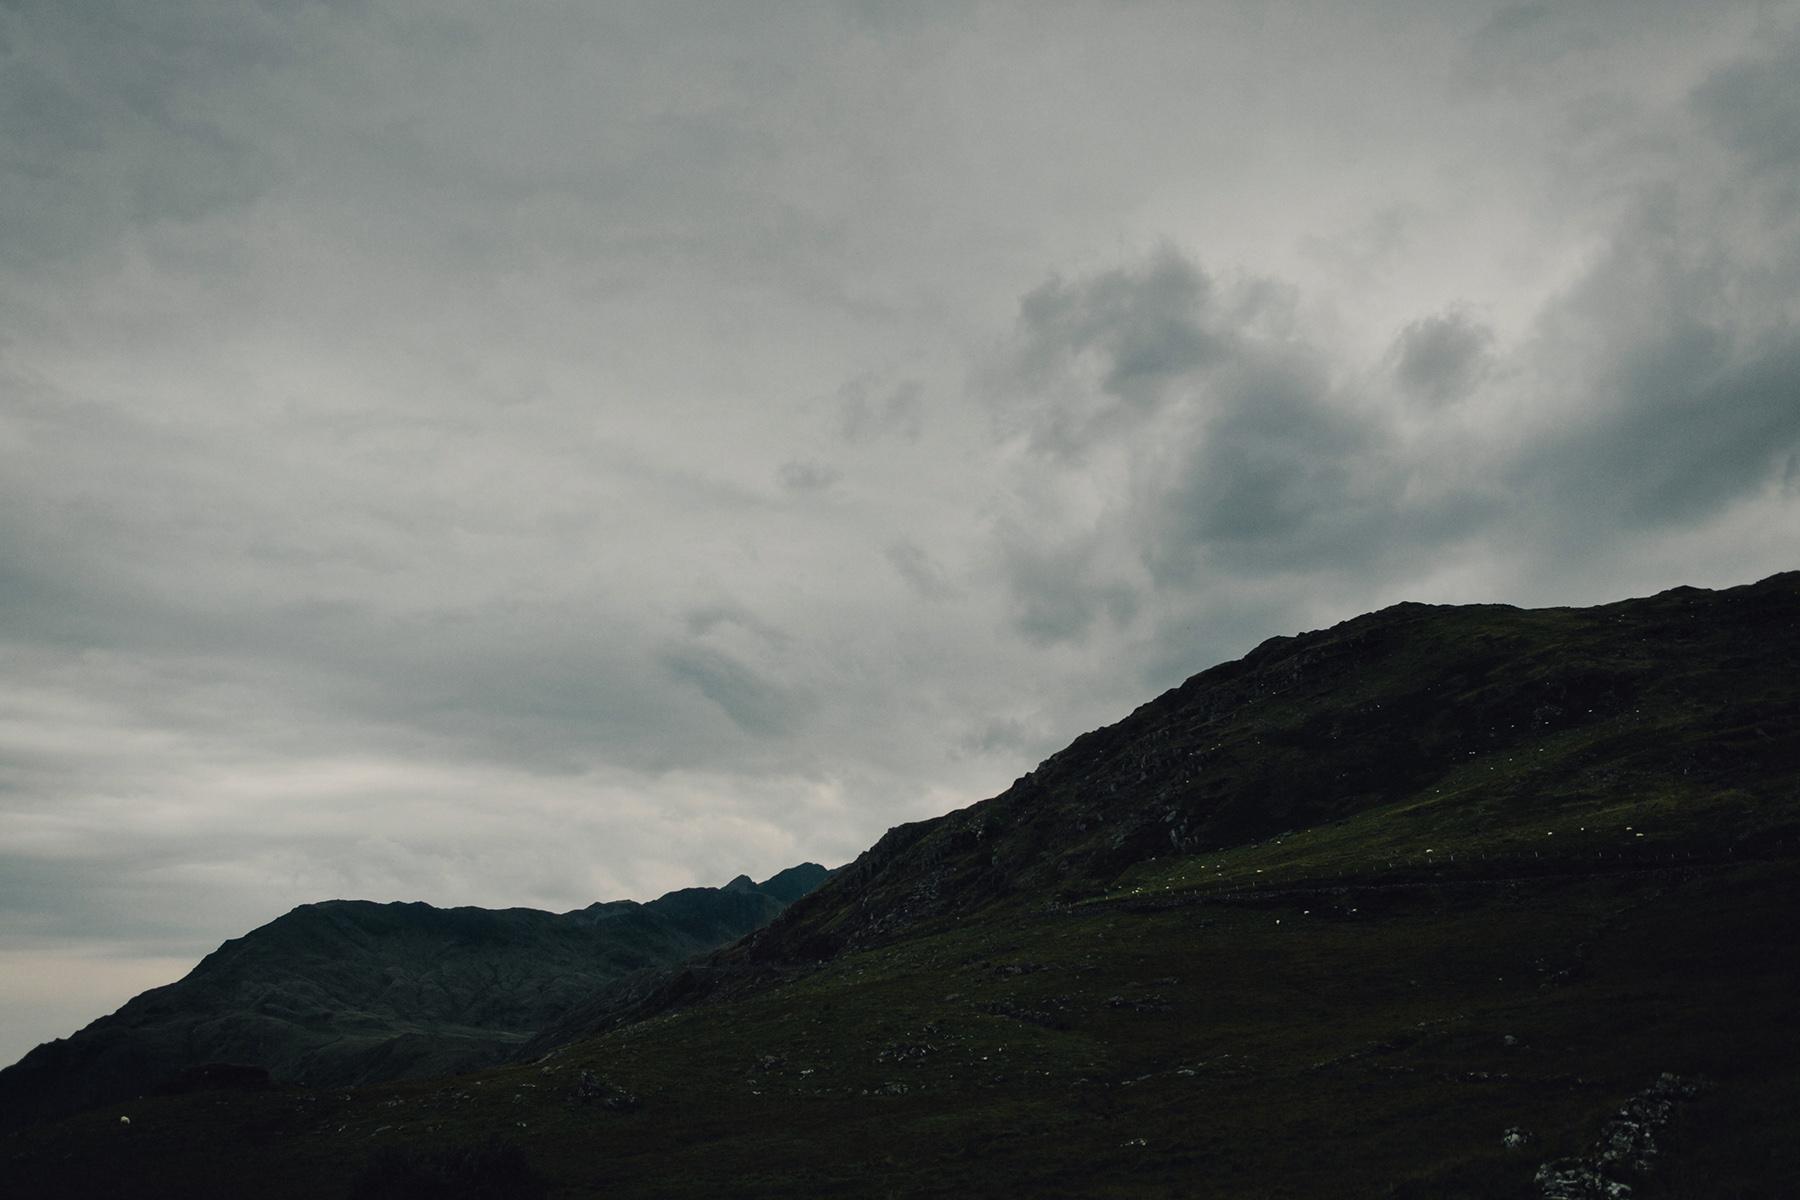 Mt-Snowdon-Hike-Photos-From-Peny-Pass-00241.jpg